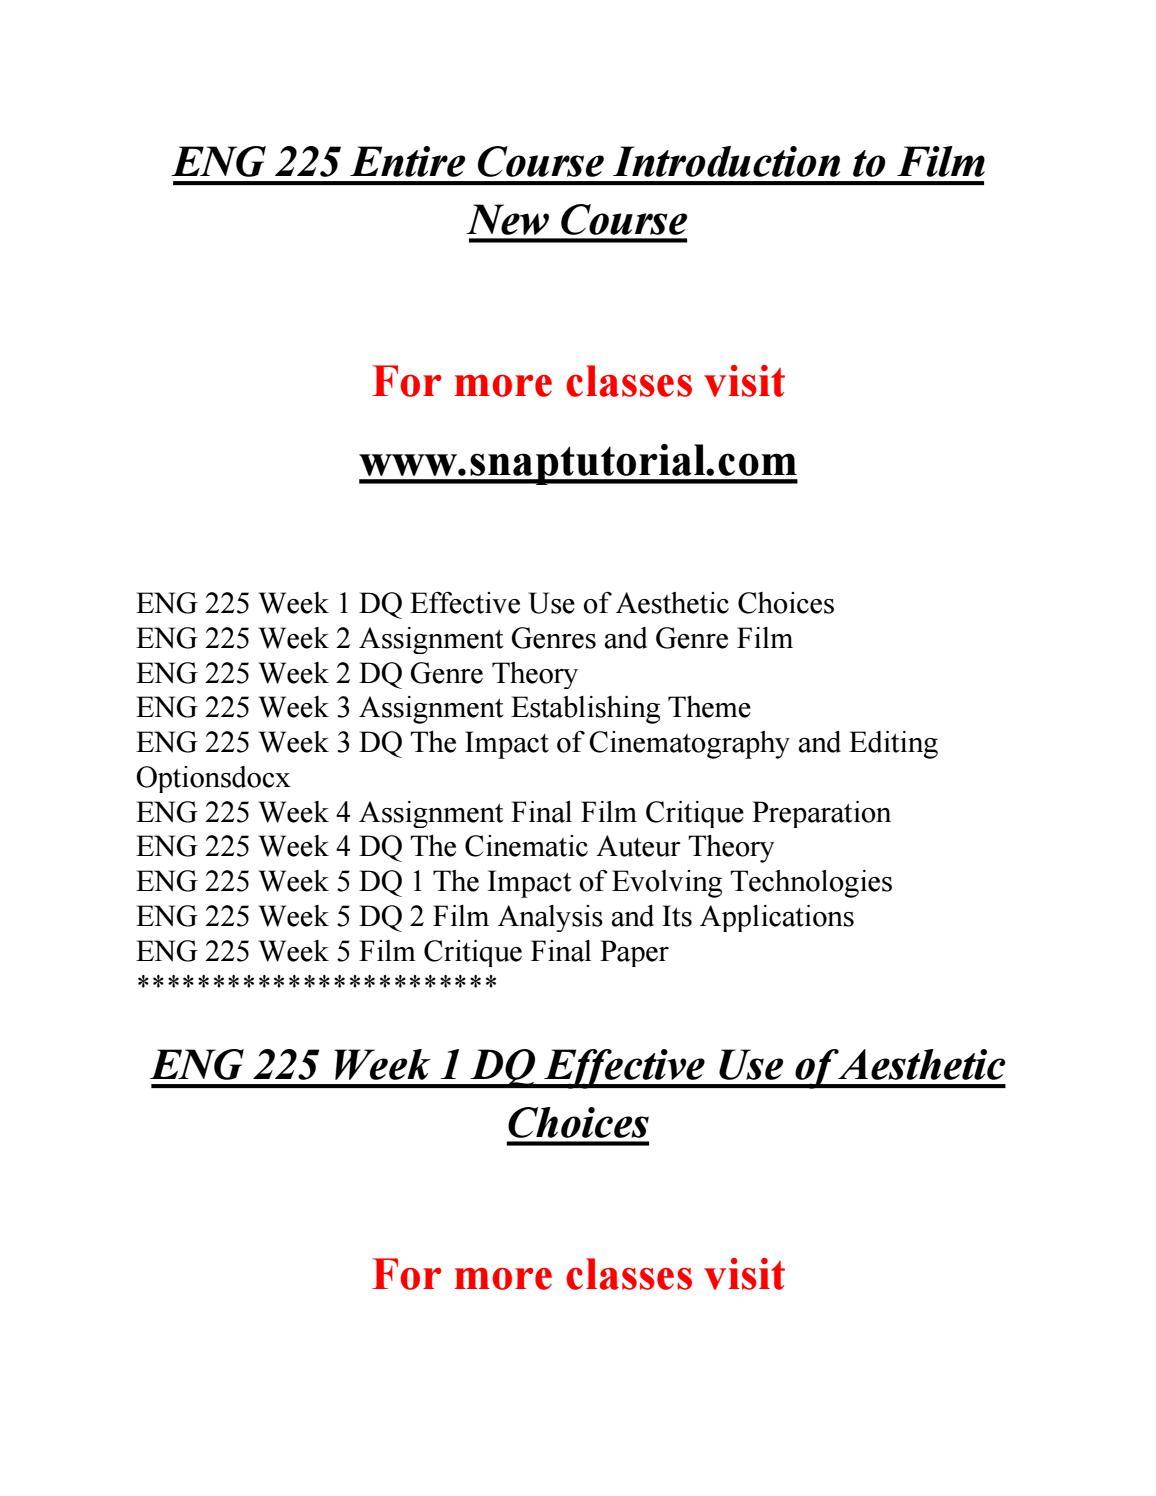 Eng 225 Education Specialist Snaptutorial Com By Mcdonaldry59 Issuu